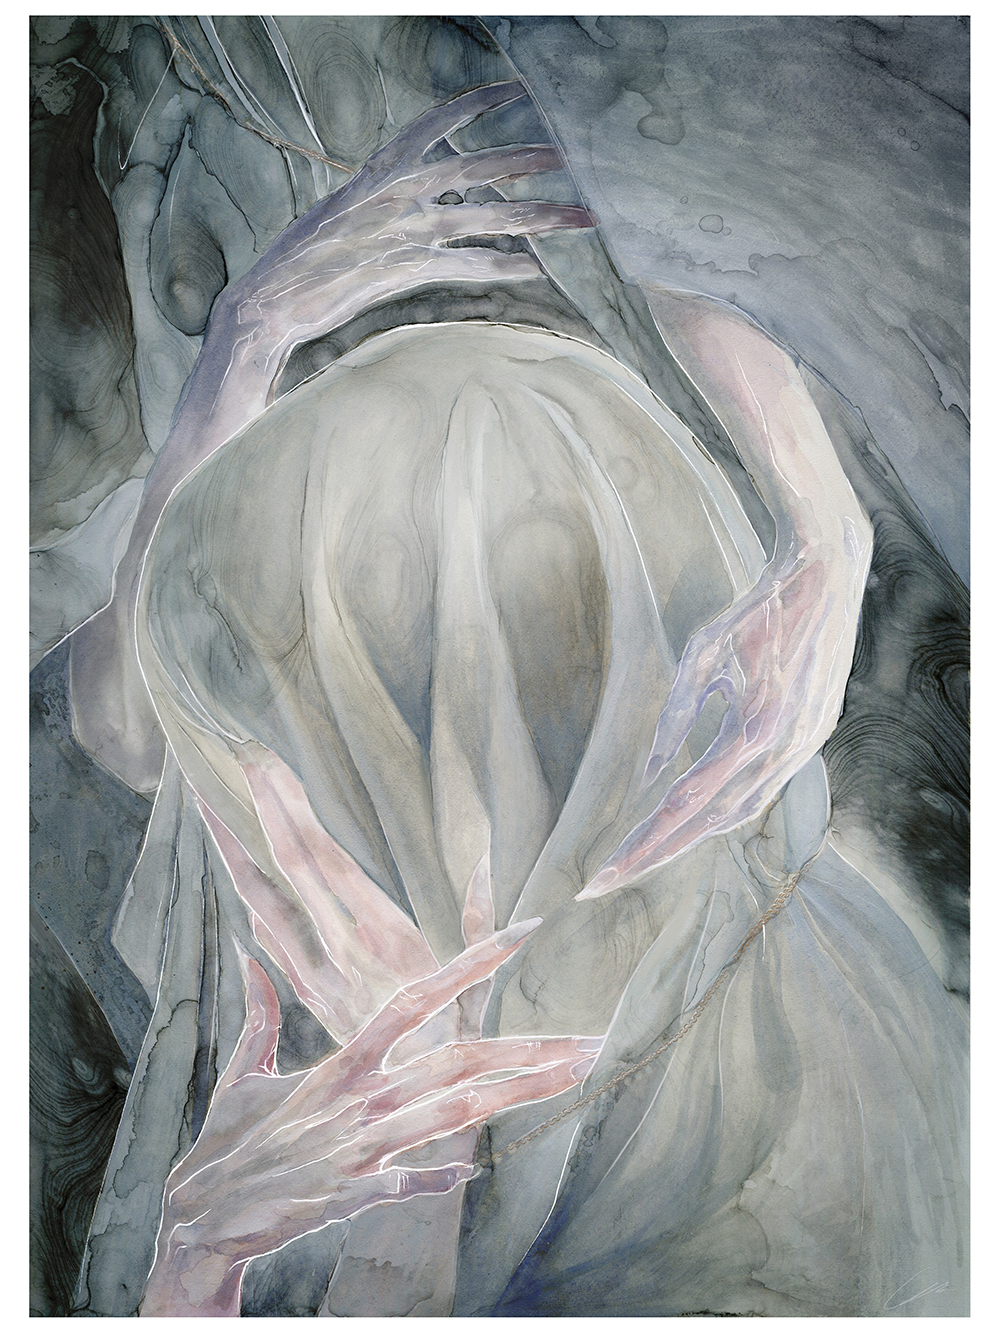 """Ghost White"" by Gabriella Liv Eriksson"